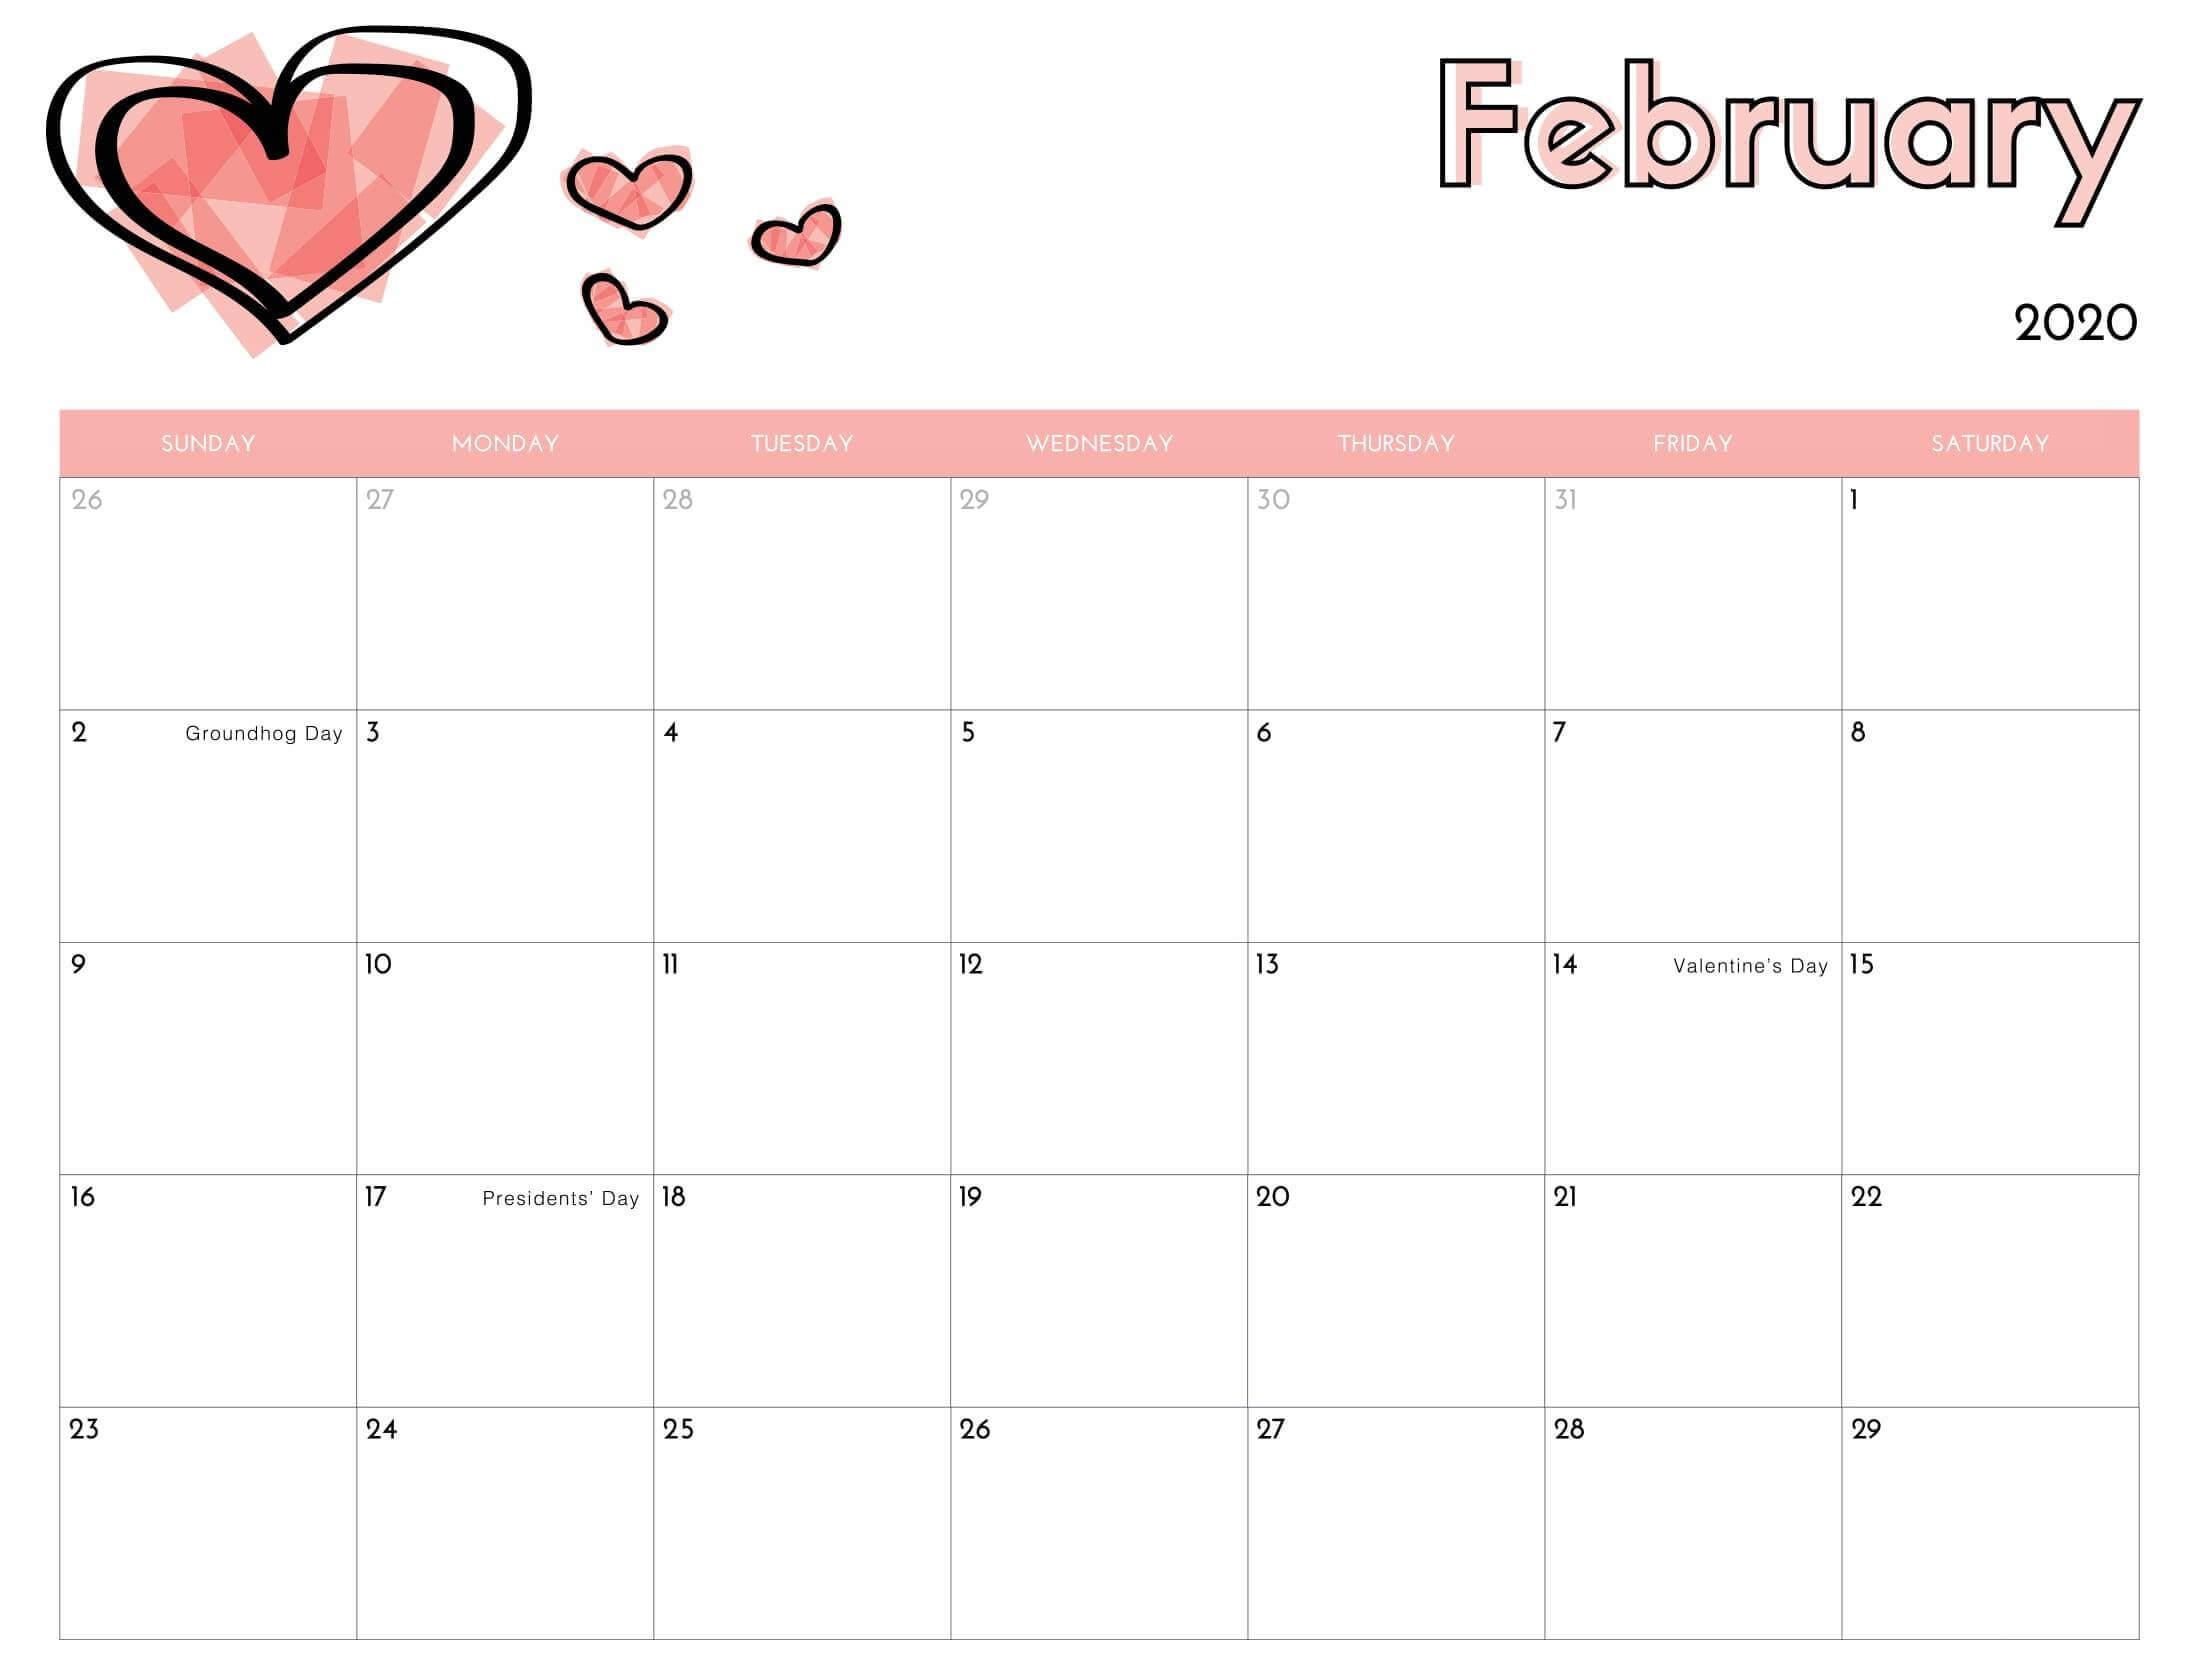 Calendar 2020 Excel  February 2020 Calendar Excel | Monthly pertaining to 2020 Calendar Excel Hong Kong